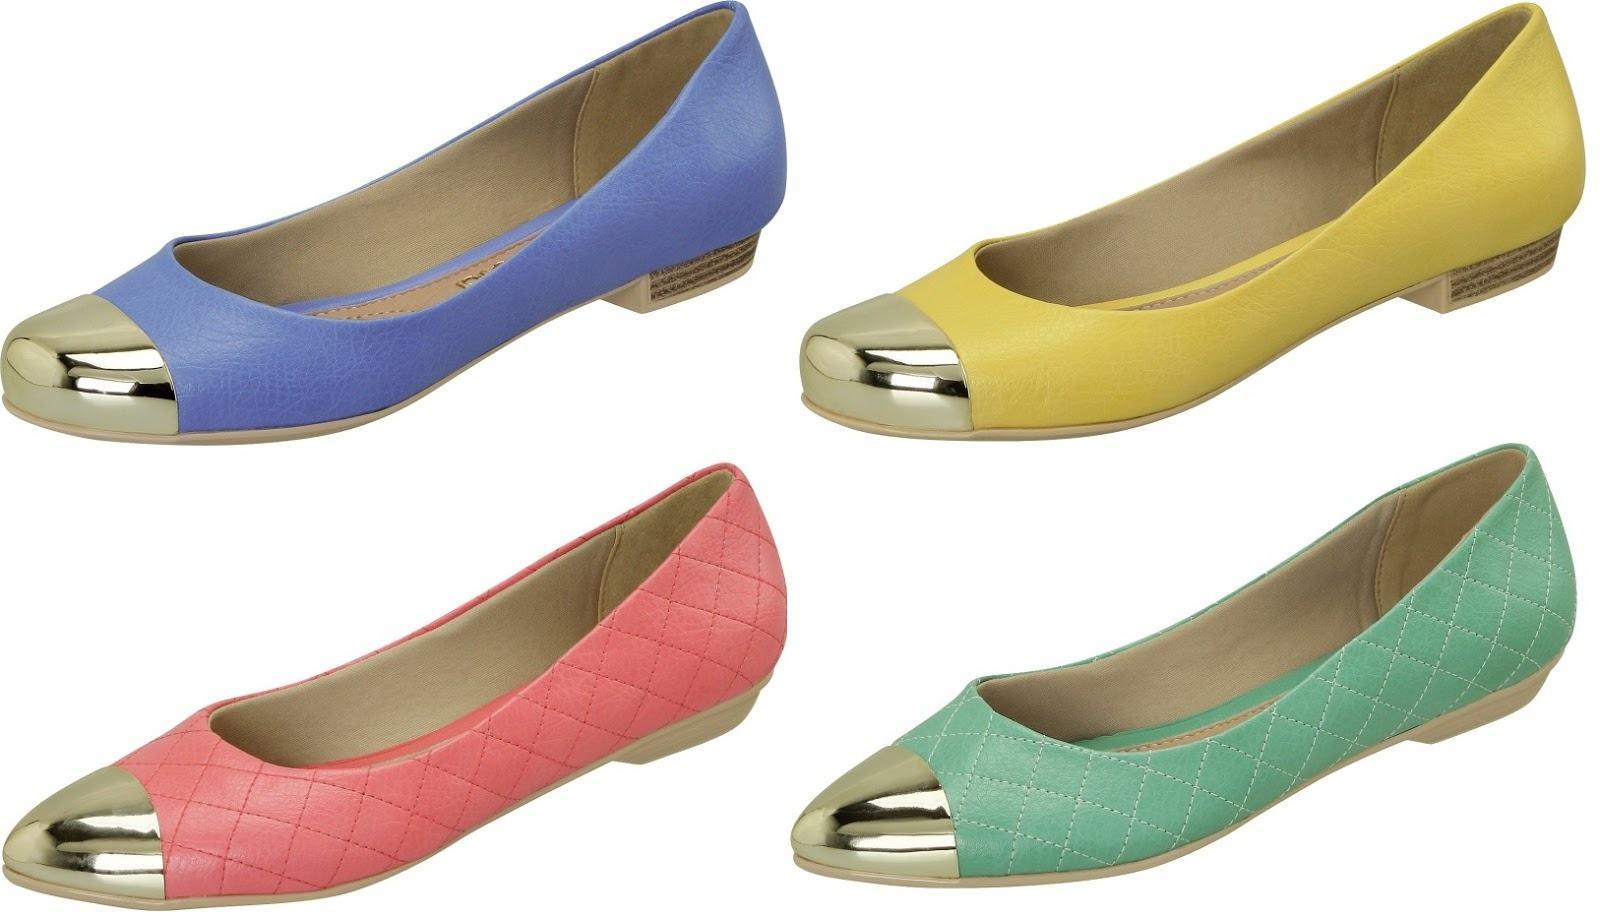 916a805d12 Sapatilhas femininas Arezzo modelos e cores